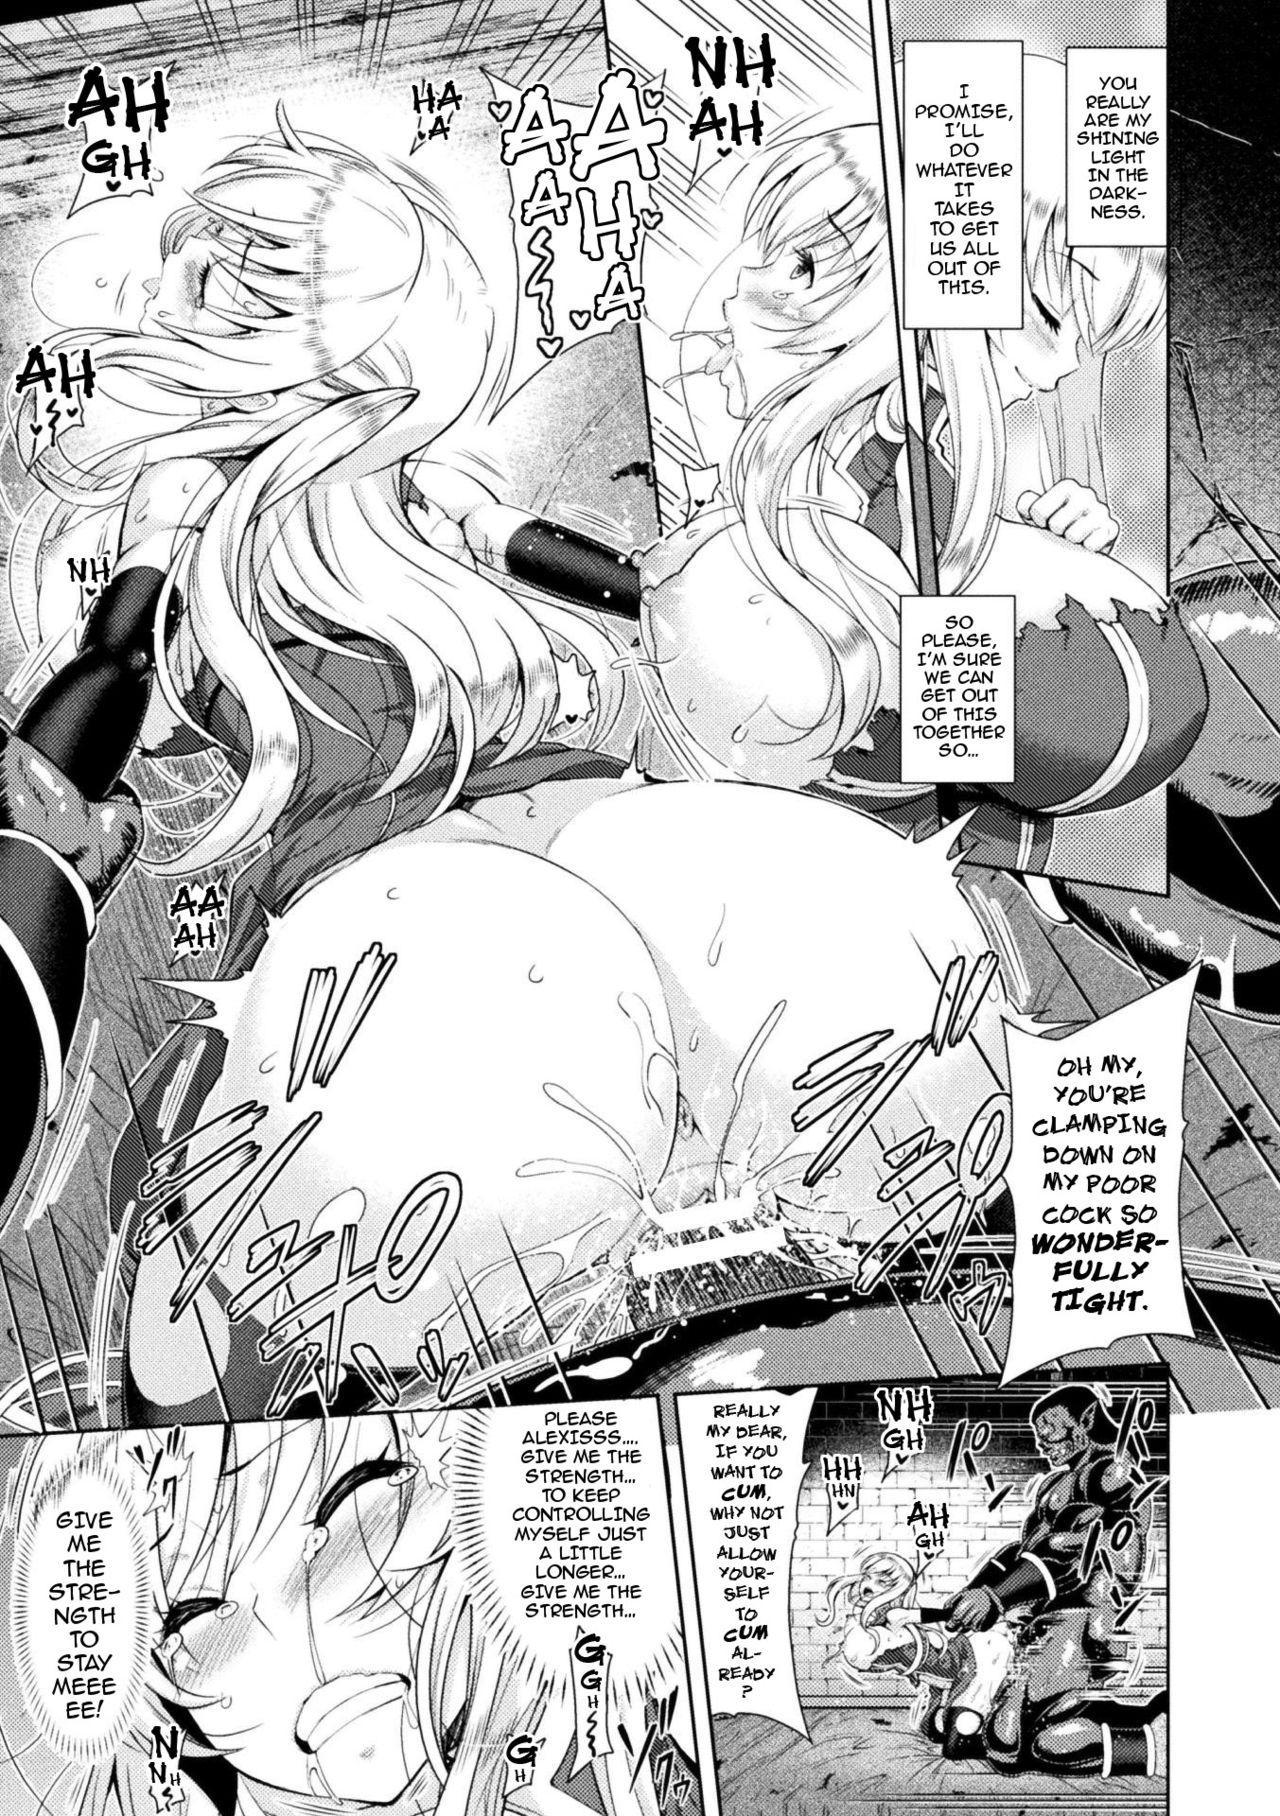 [Yamada Gogogo] Erona ~Orc no Inmon ni Okasareta Onna Kishi no Matsuro~ | Erona ~The Fall of a Beautiful Knight Cursed with the Lewd Mark of an Orc~ Ch. 1-5 [English] {darknight} 35